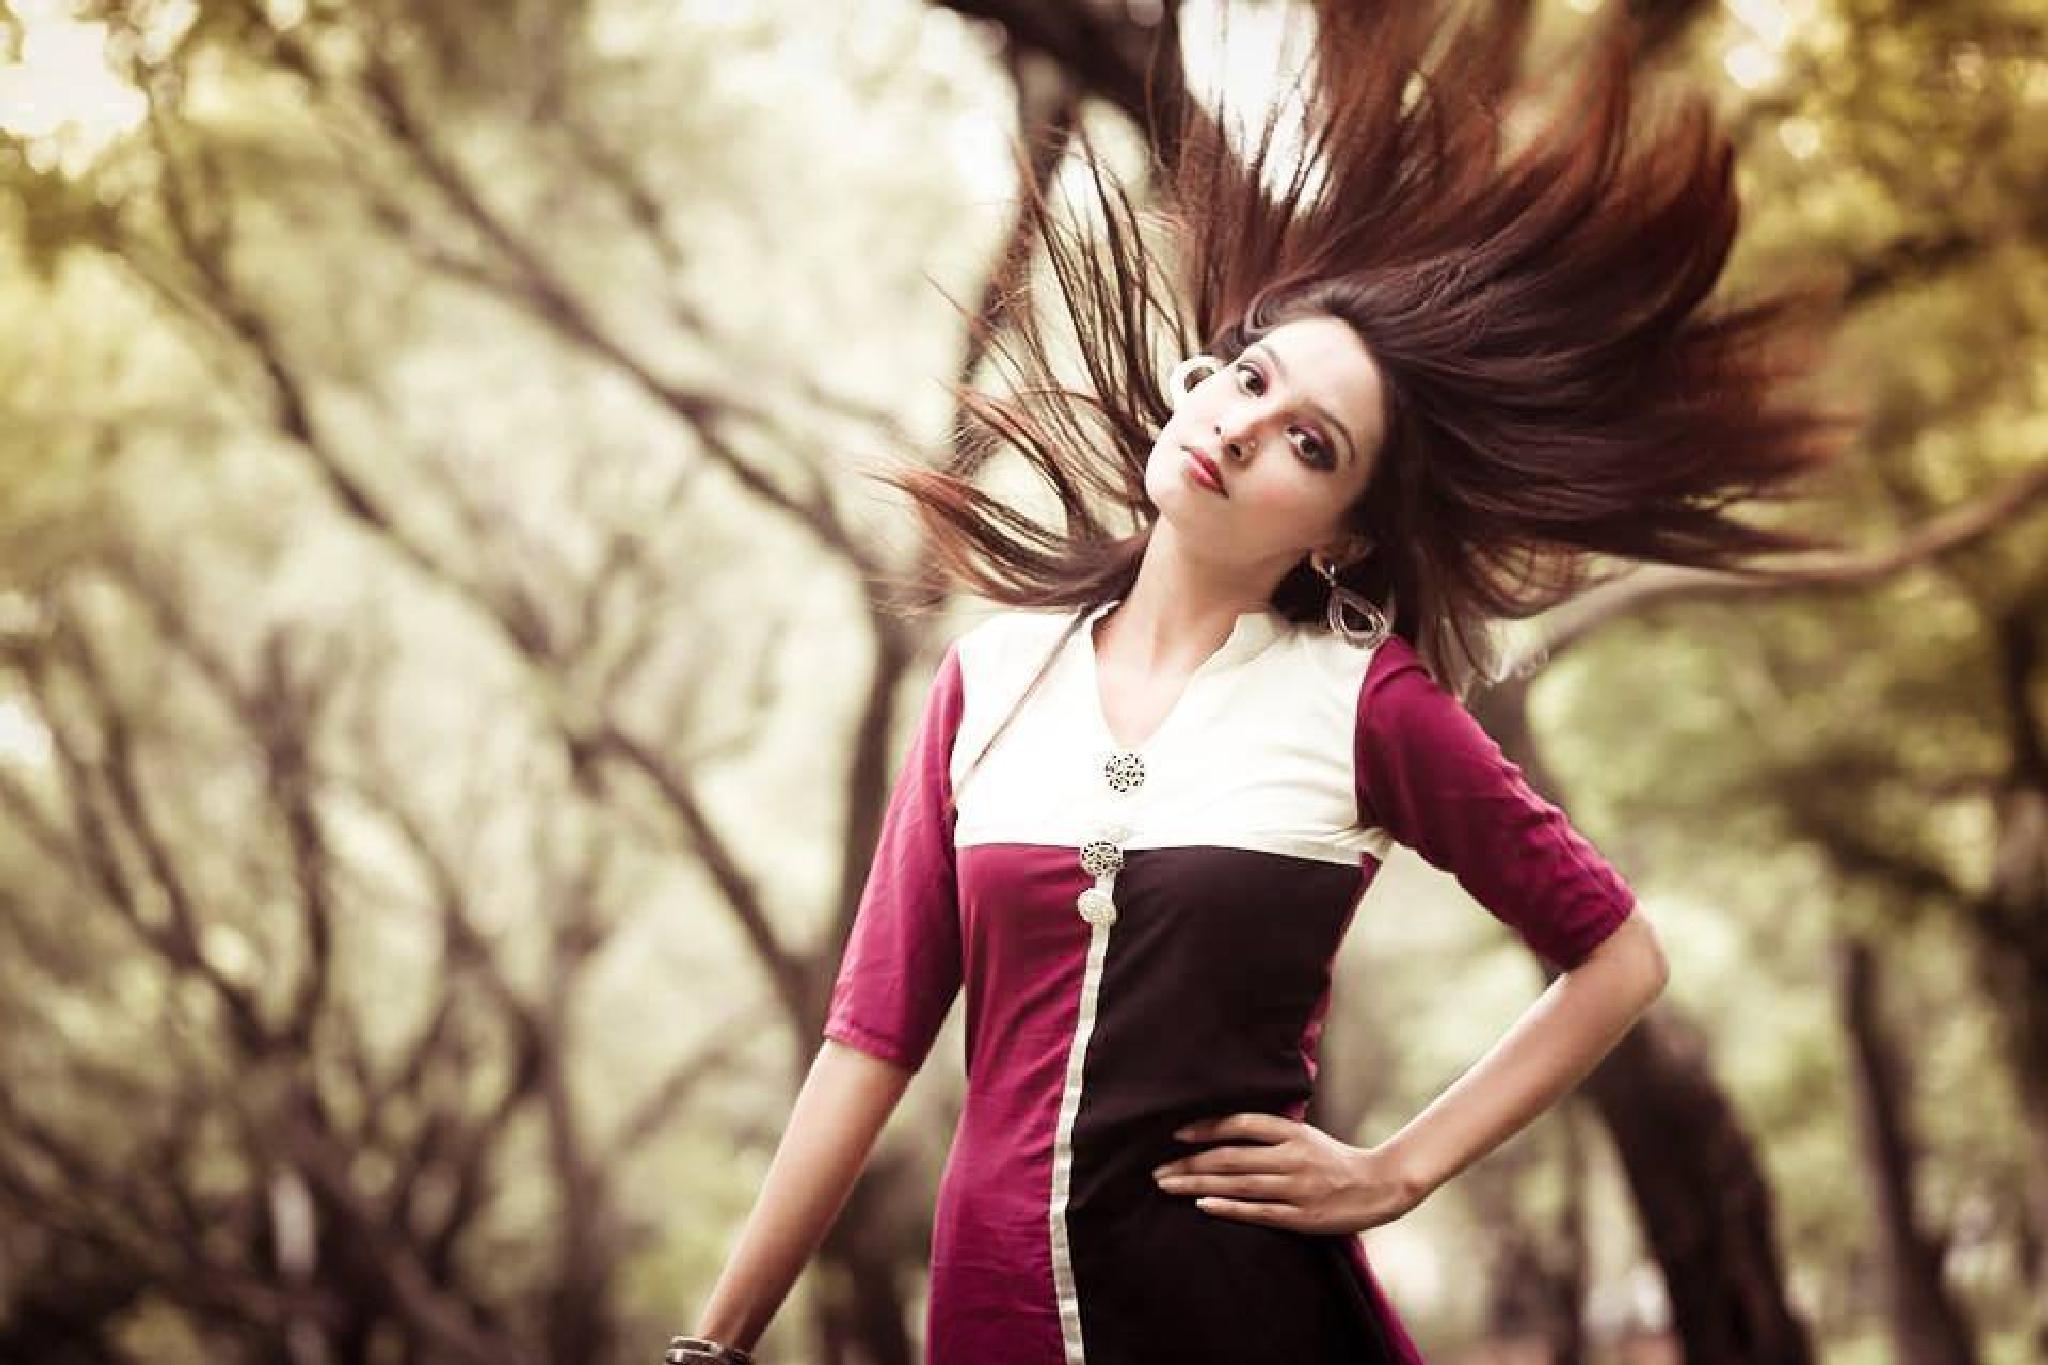 Wind of change by zebran.h.navid